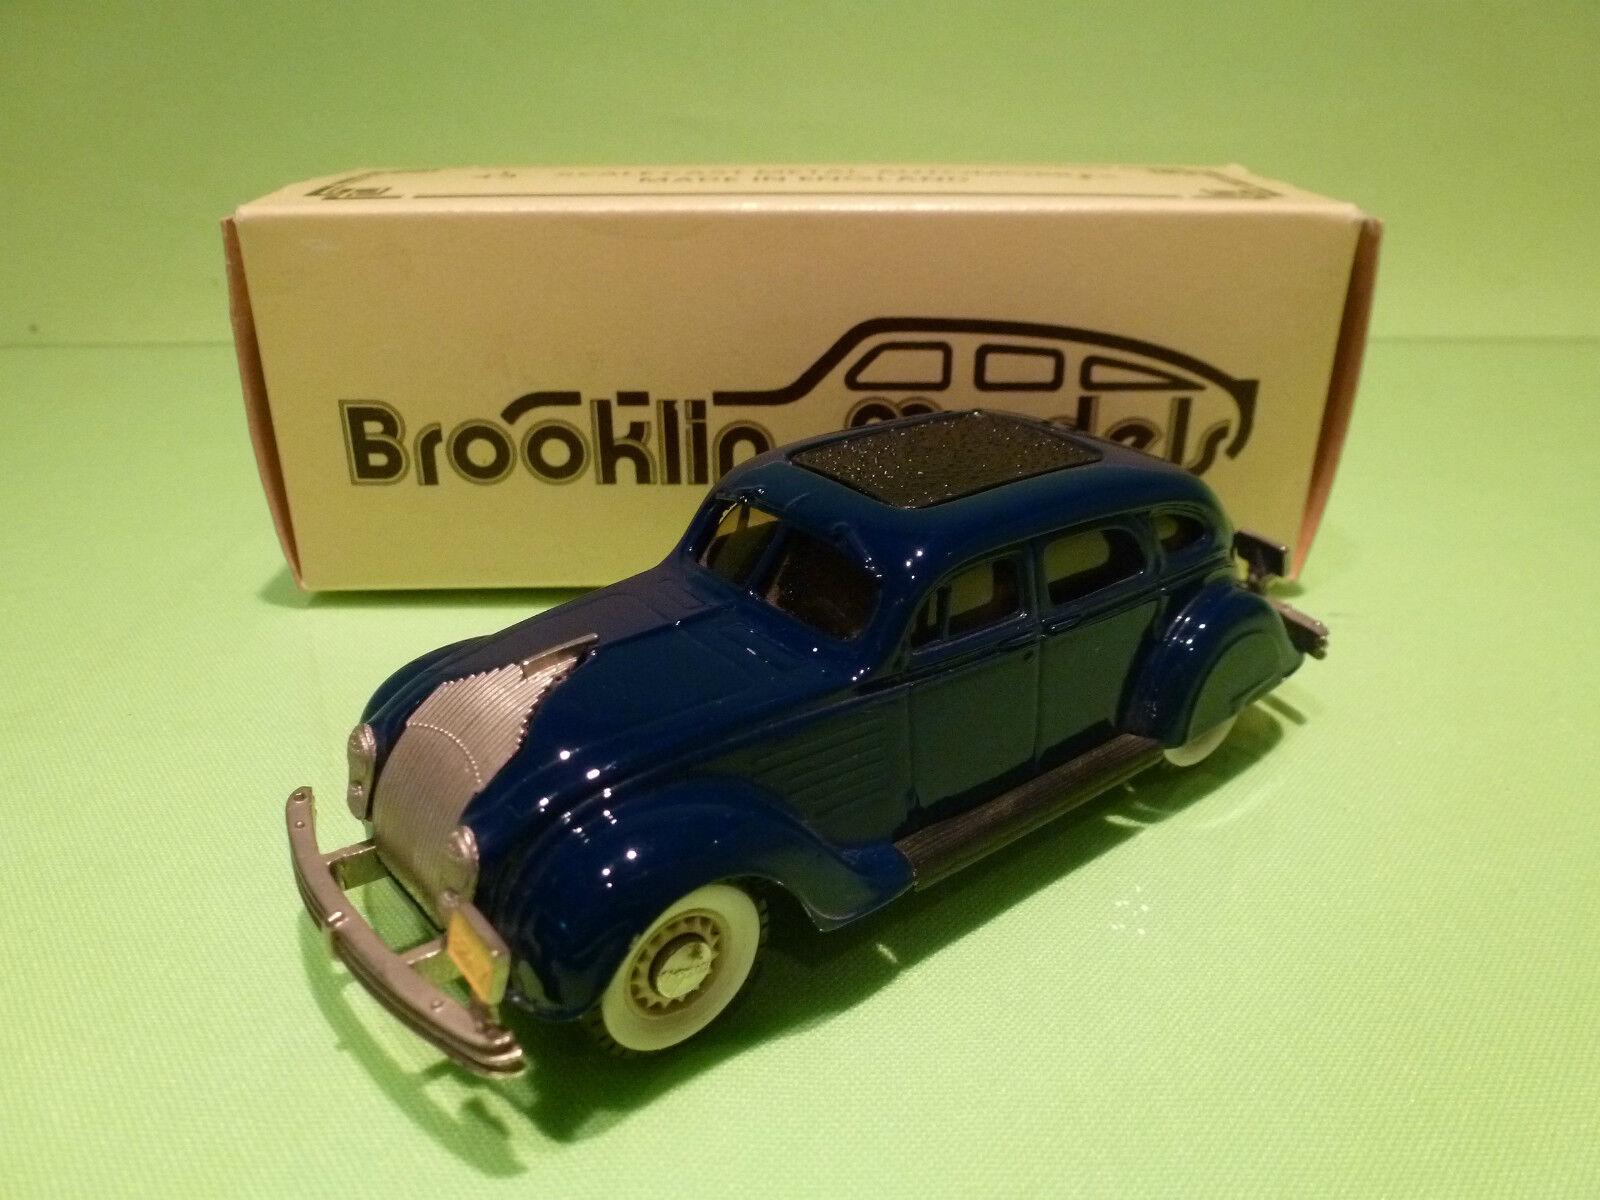 BROOKLIN MODELS BRK 7 CHRYSLER AIRFLOW 4-DOORS 4-DOORS 4-DOORS 1934 - 1 43 - NEAR MINT IN BOX 427b97